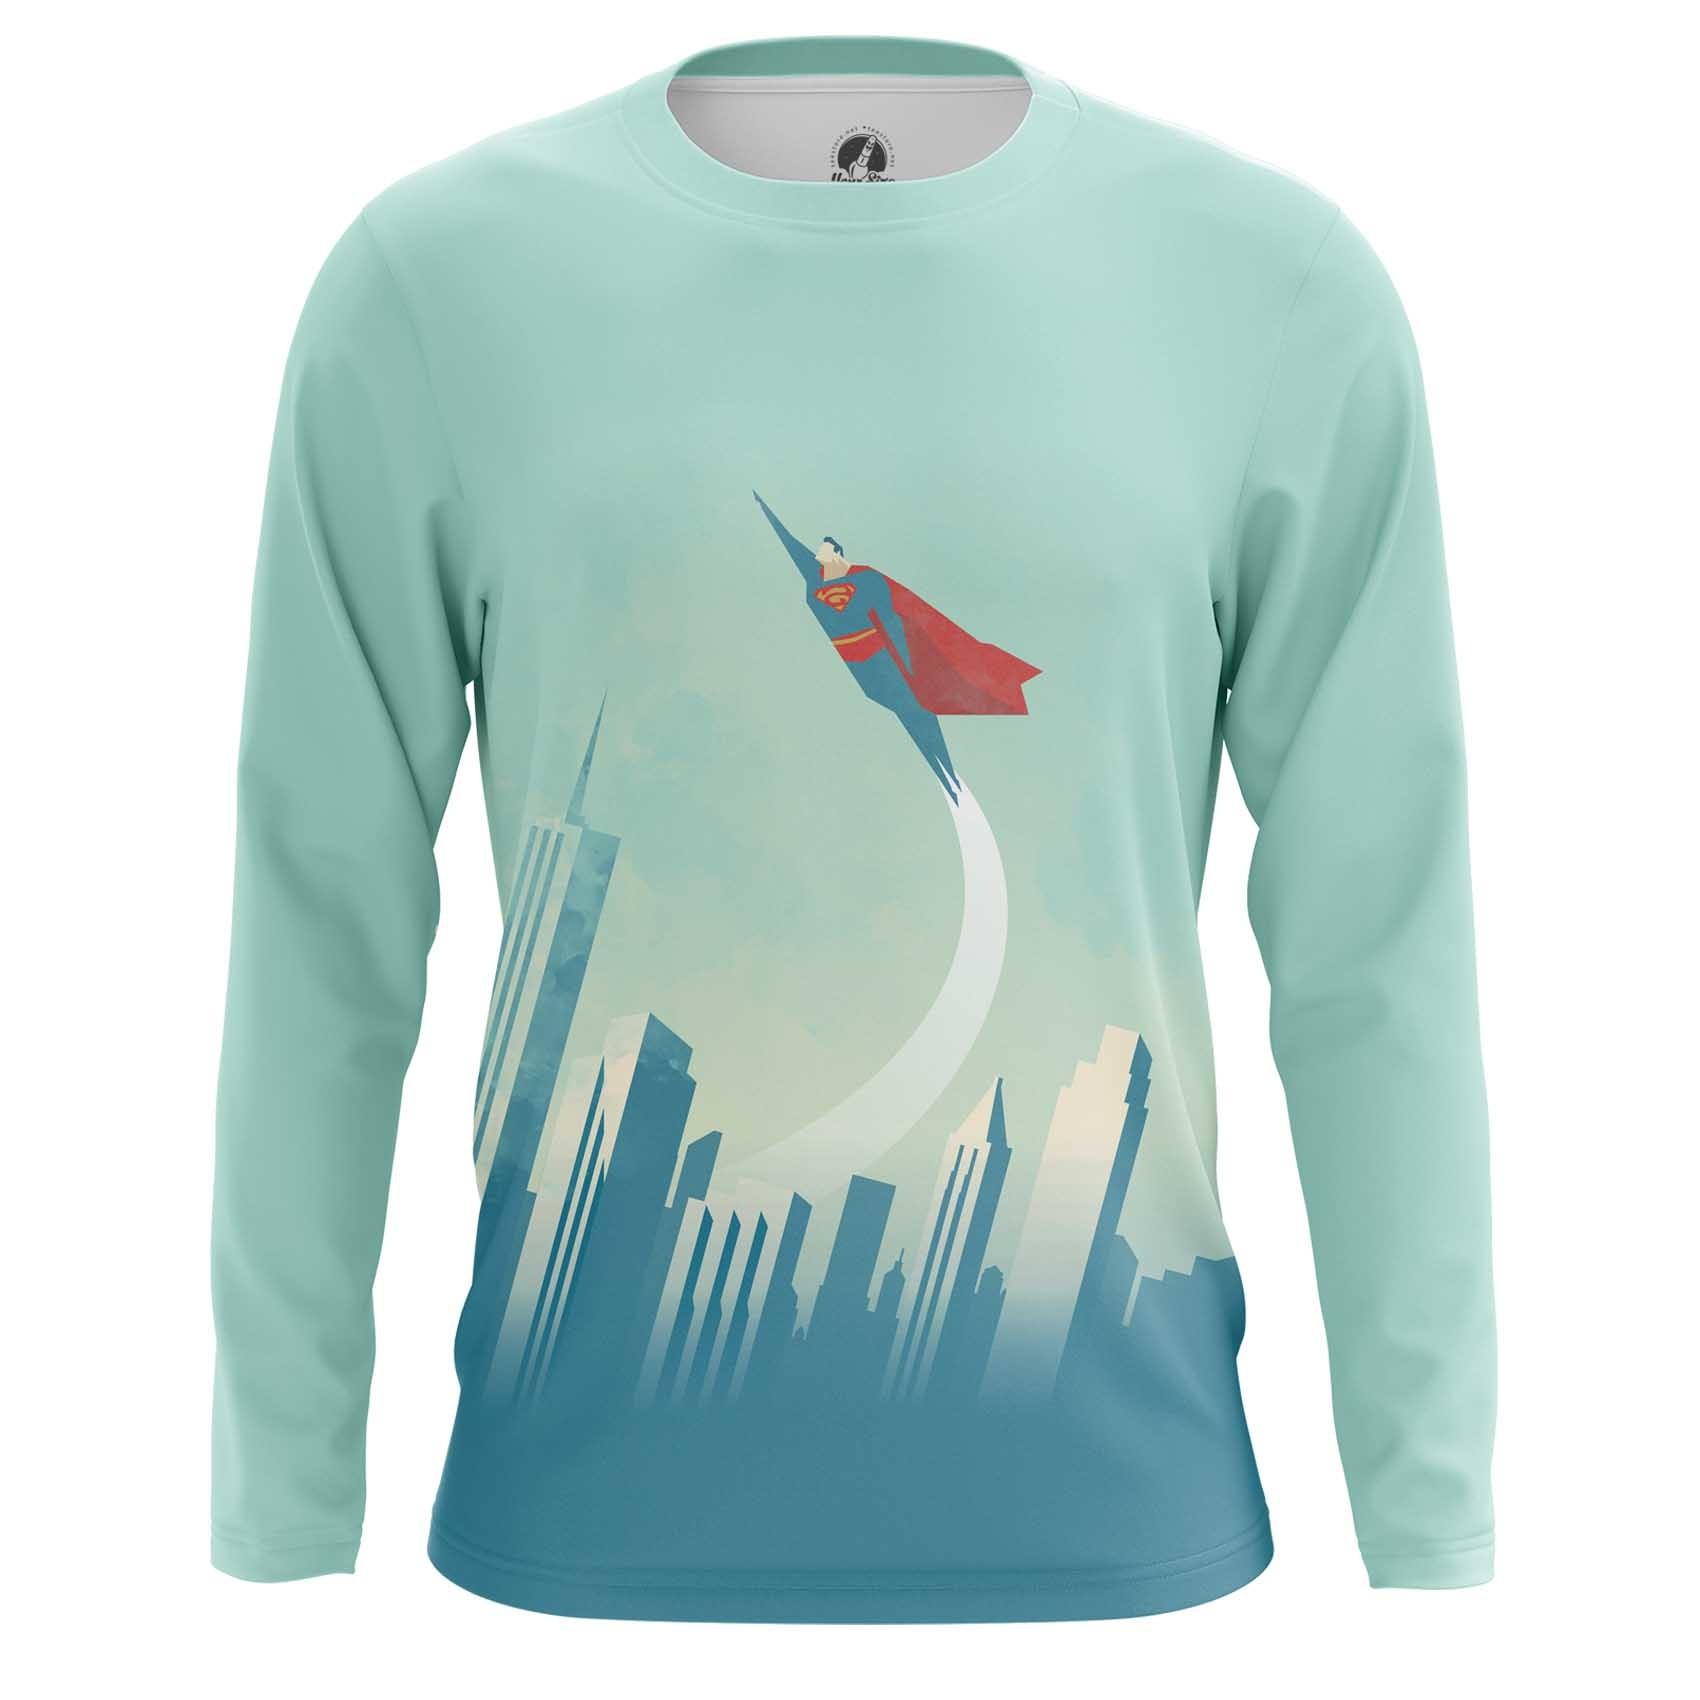 Collectibles Men'S T-Shirt Superman Dc Nyc New York Universe